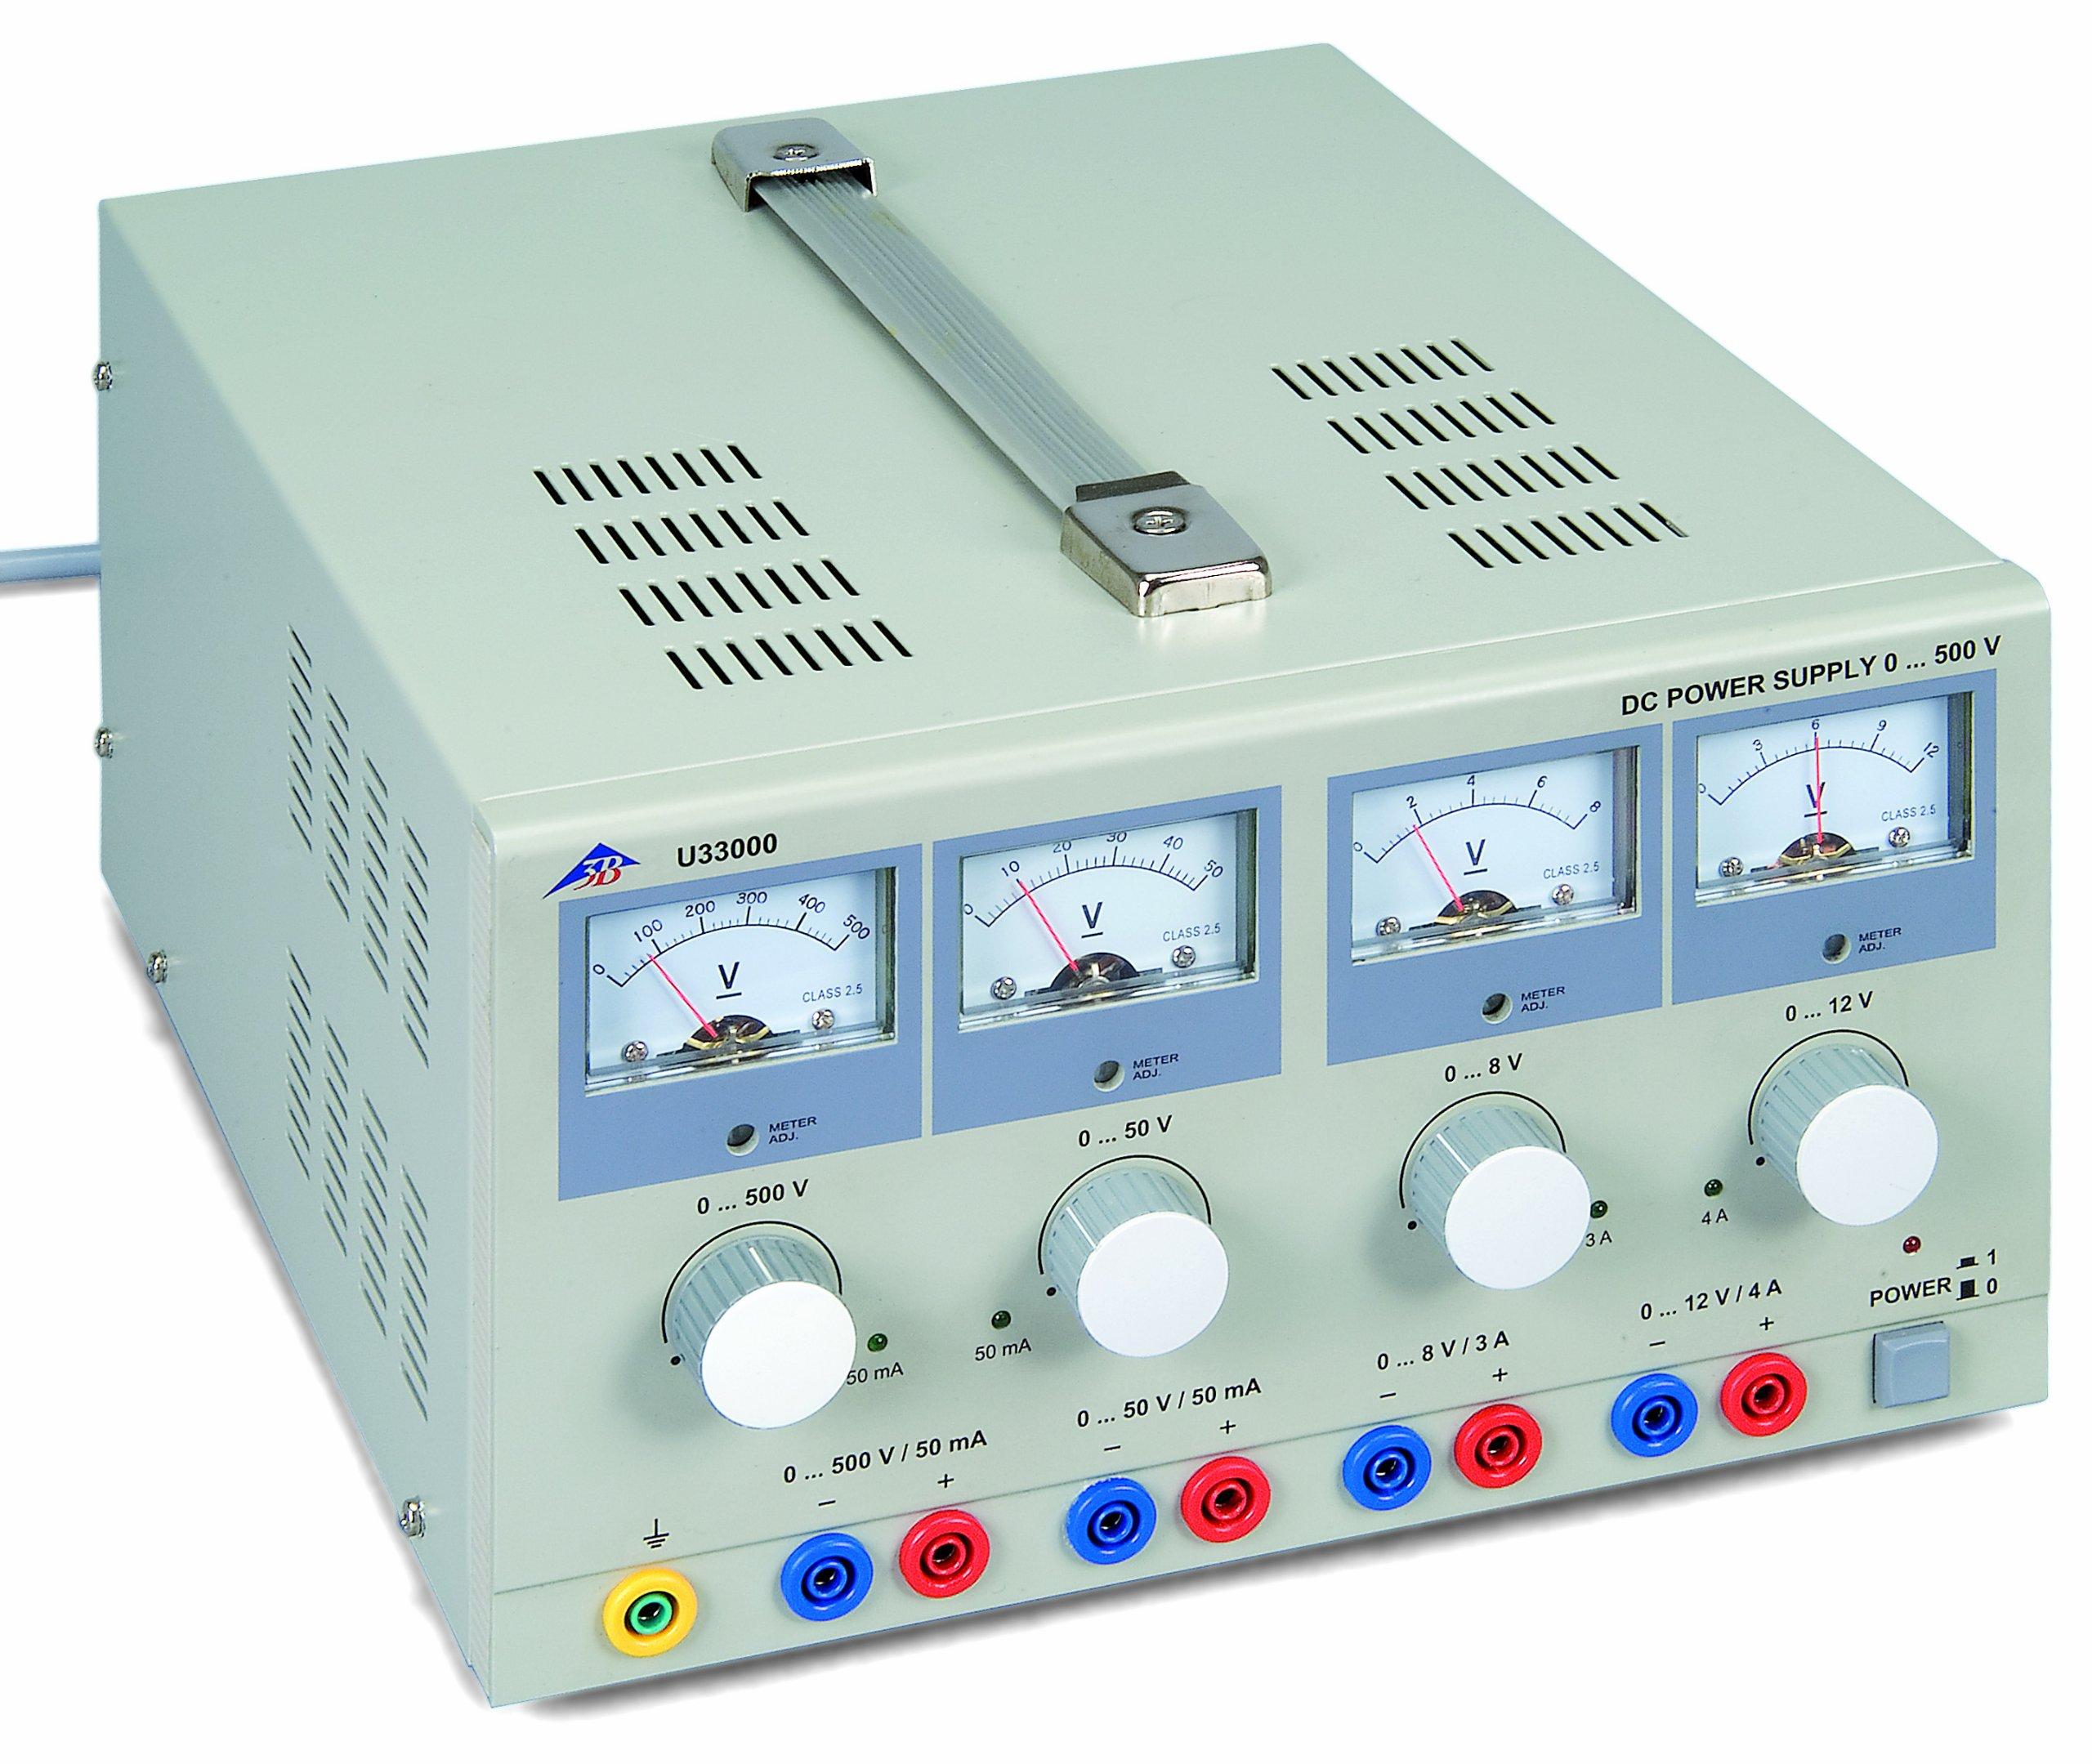 3B Scientific U33000-230 DC Power Supply, 0-500 VDC